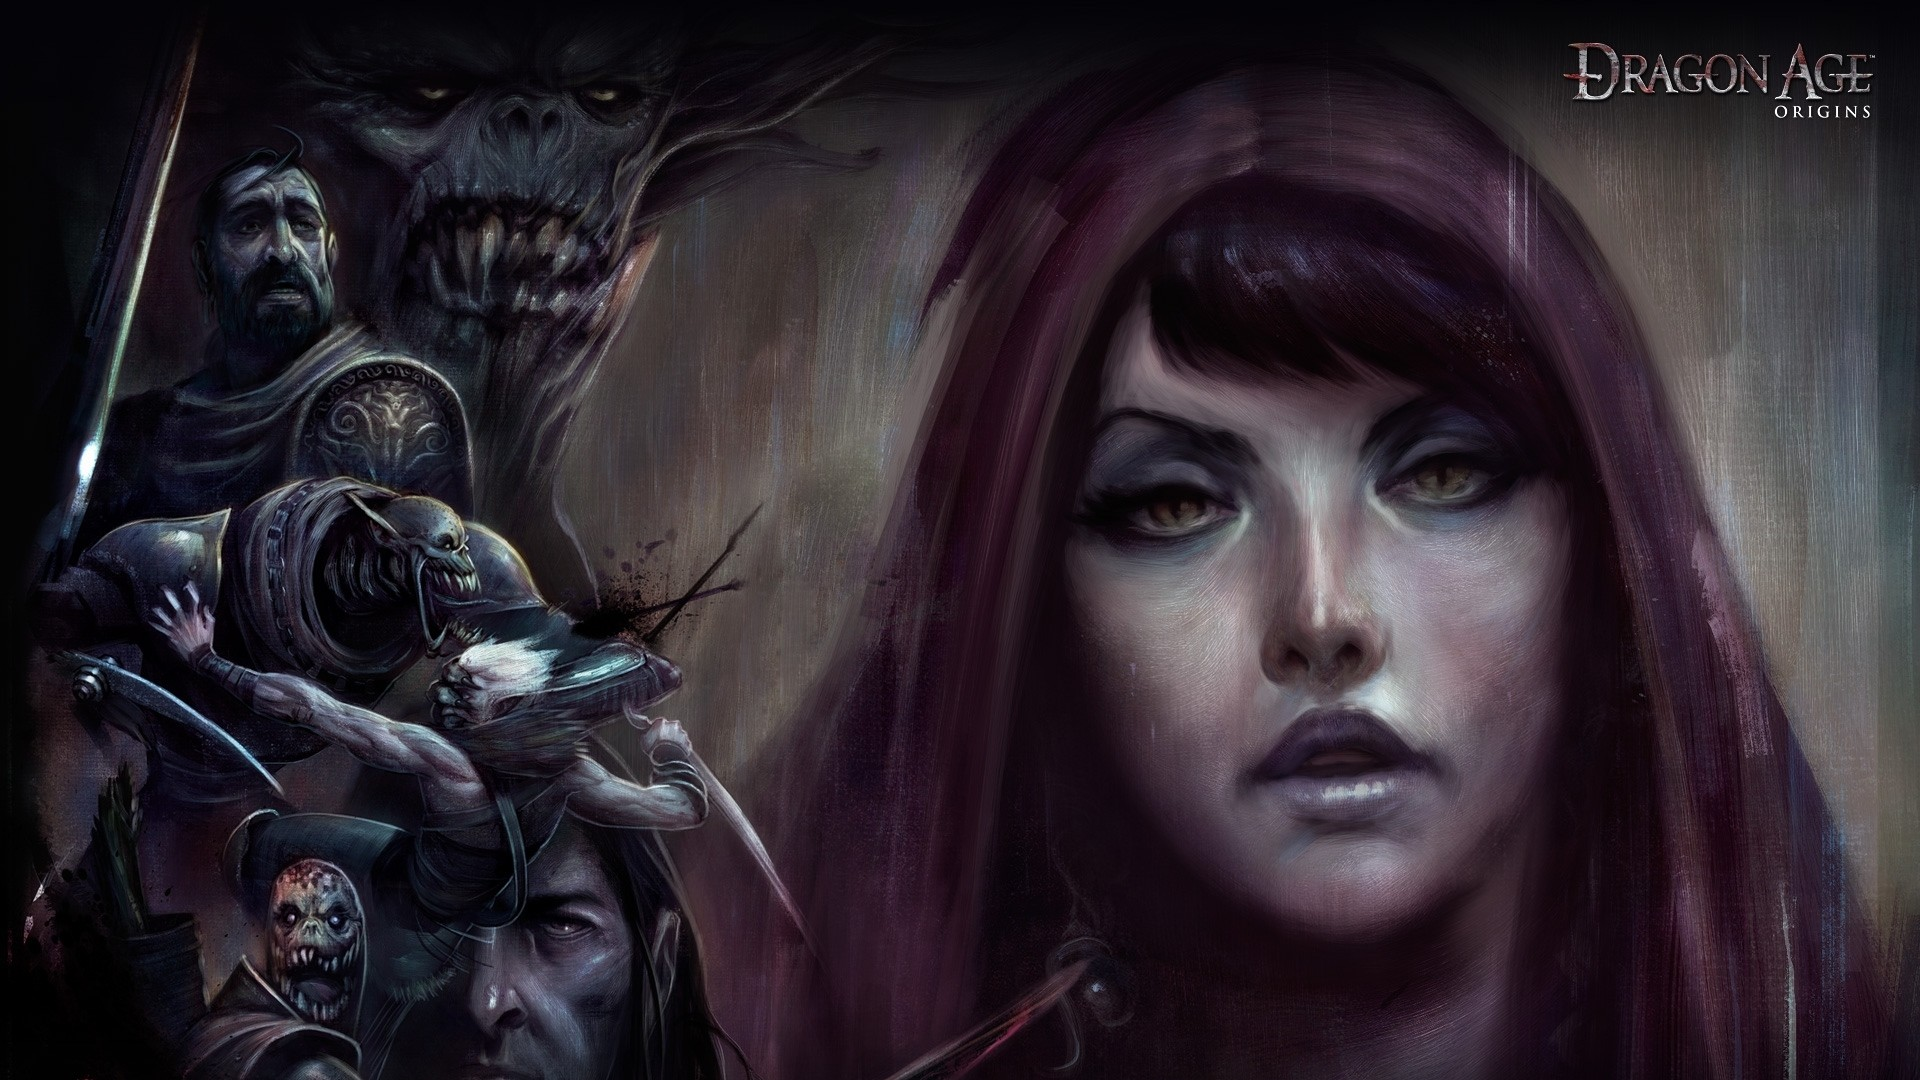 Wallpaper dragon age origins, girl, face, look, monsters